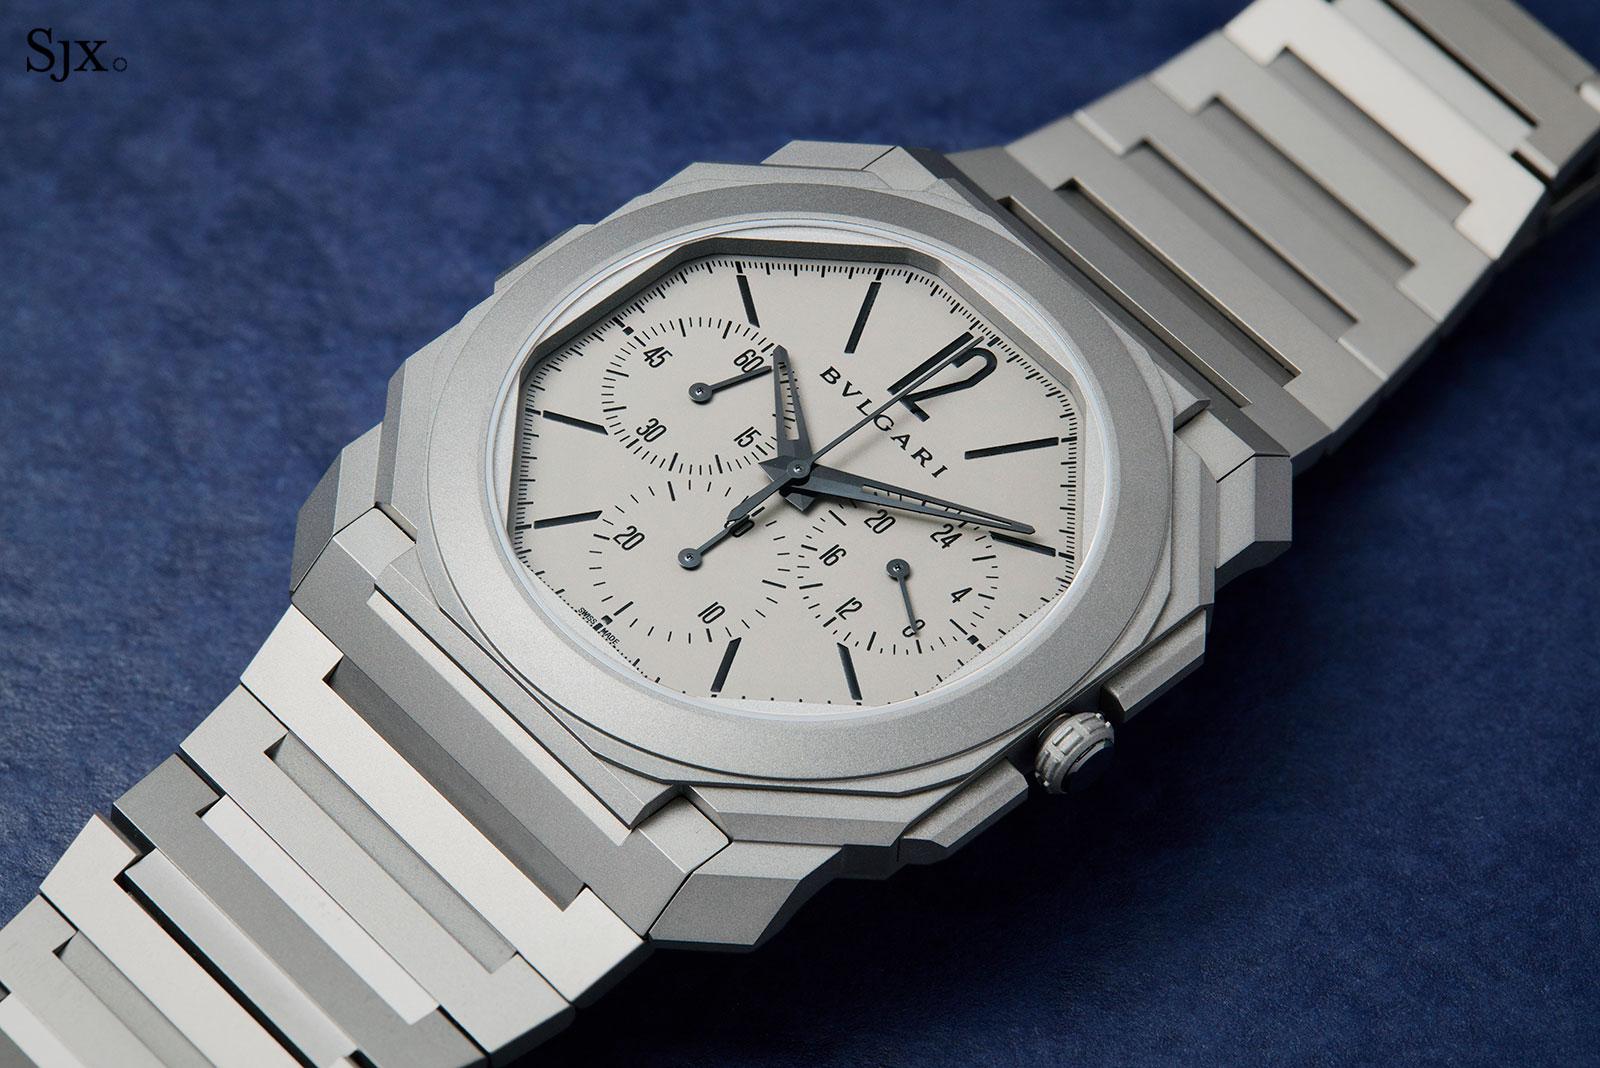 Bulgari Octo Finissimo Chronograph GMT Automatic 3